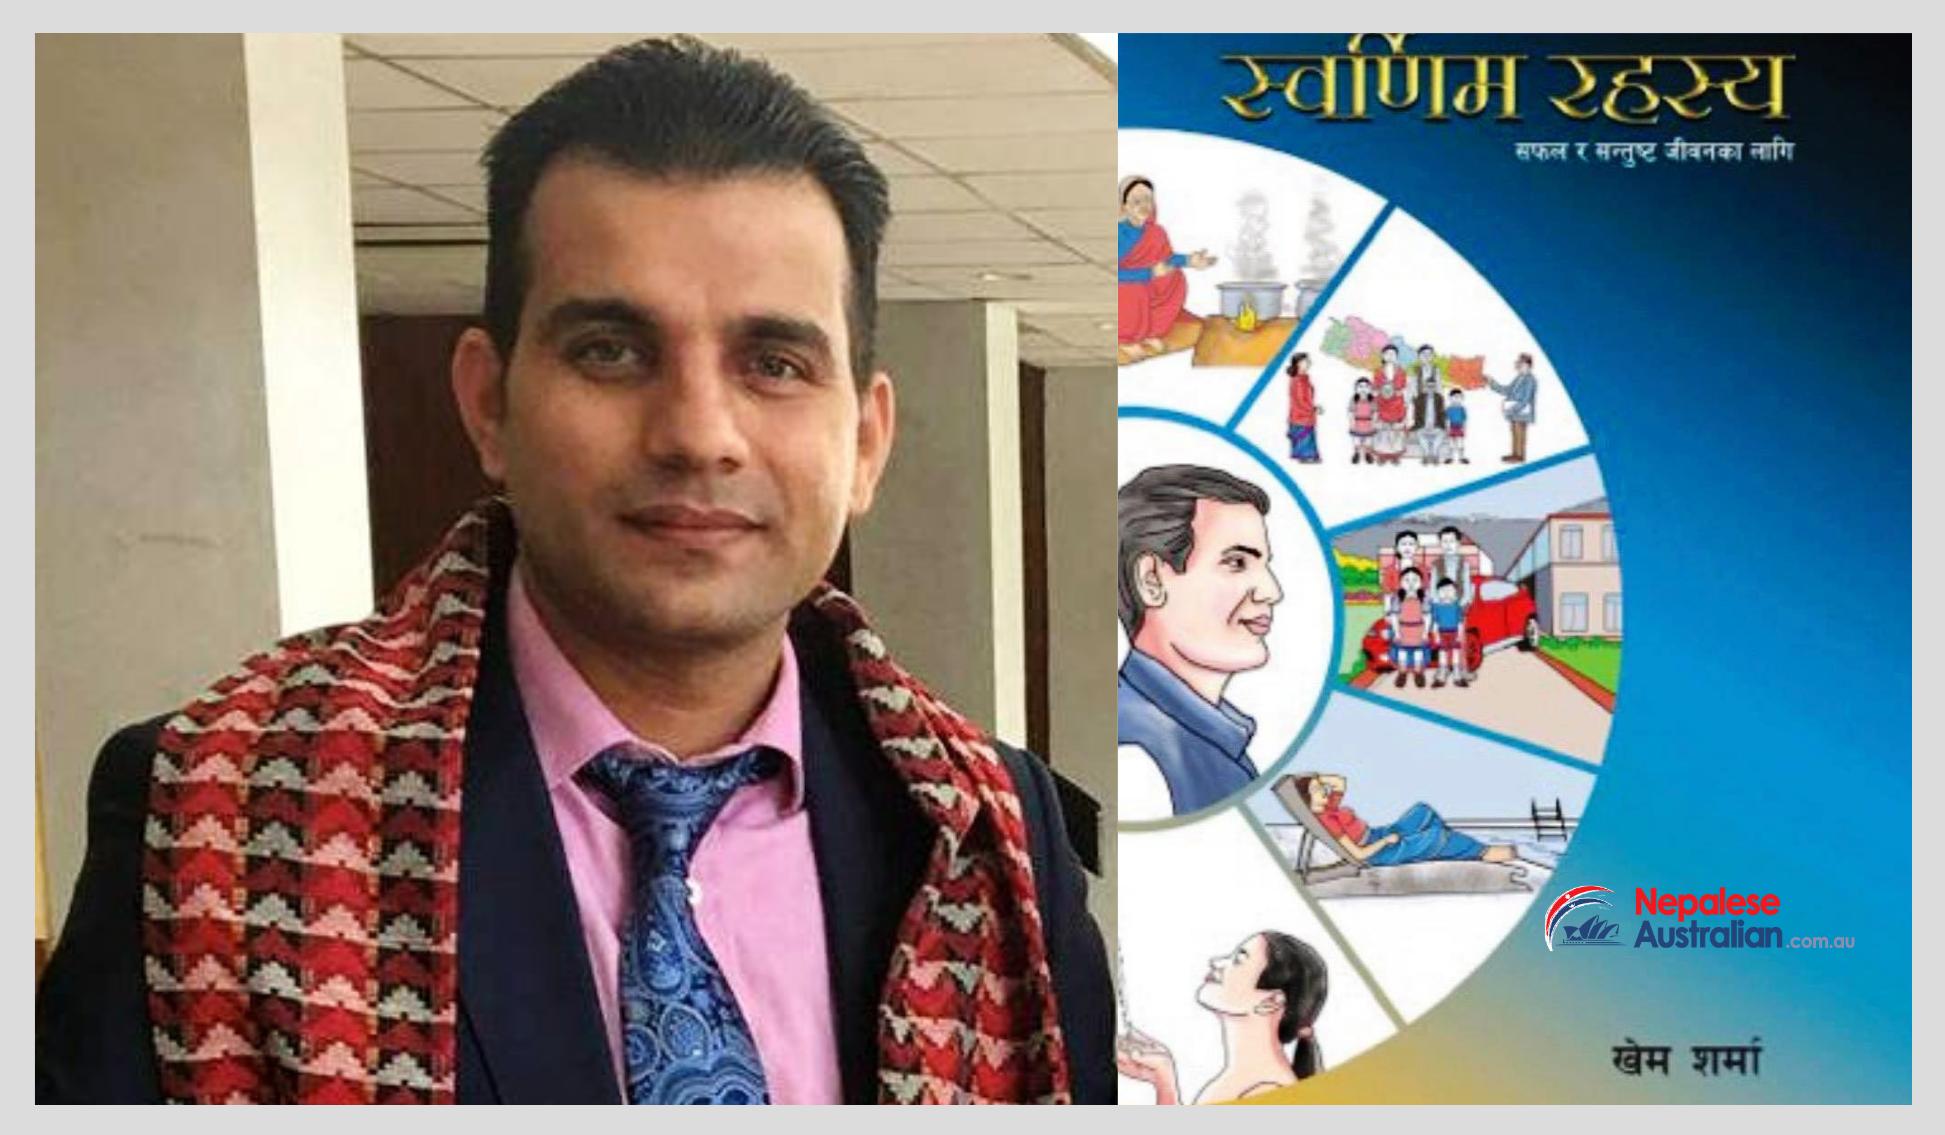 Khem Sharma's 'SwornimRahasya'to be Launched in Sydney